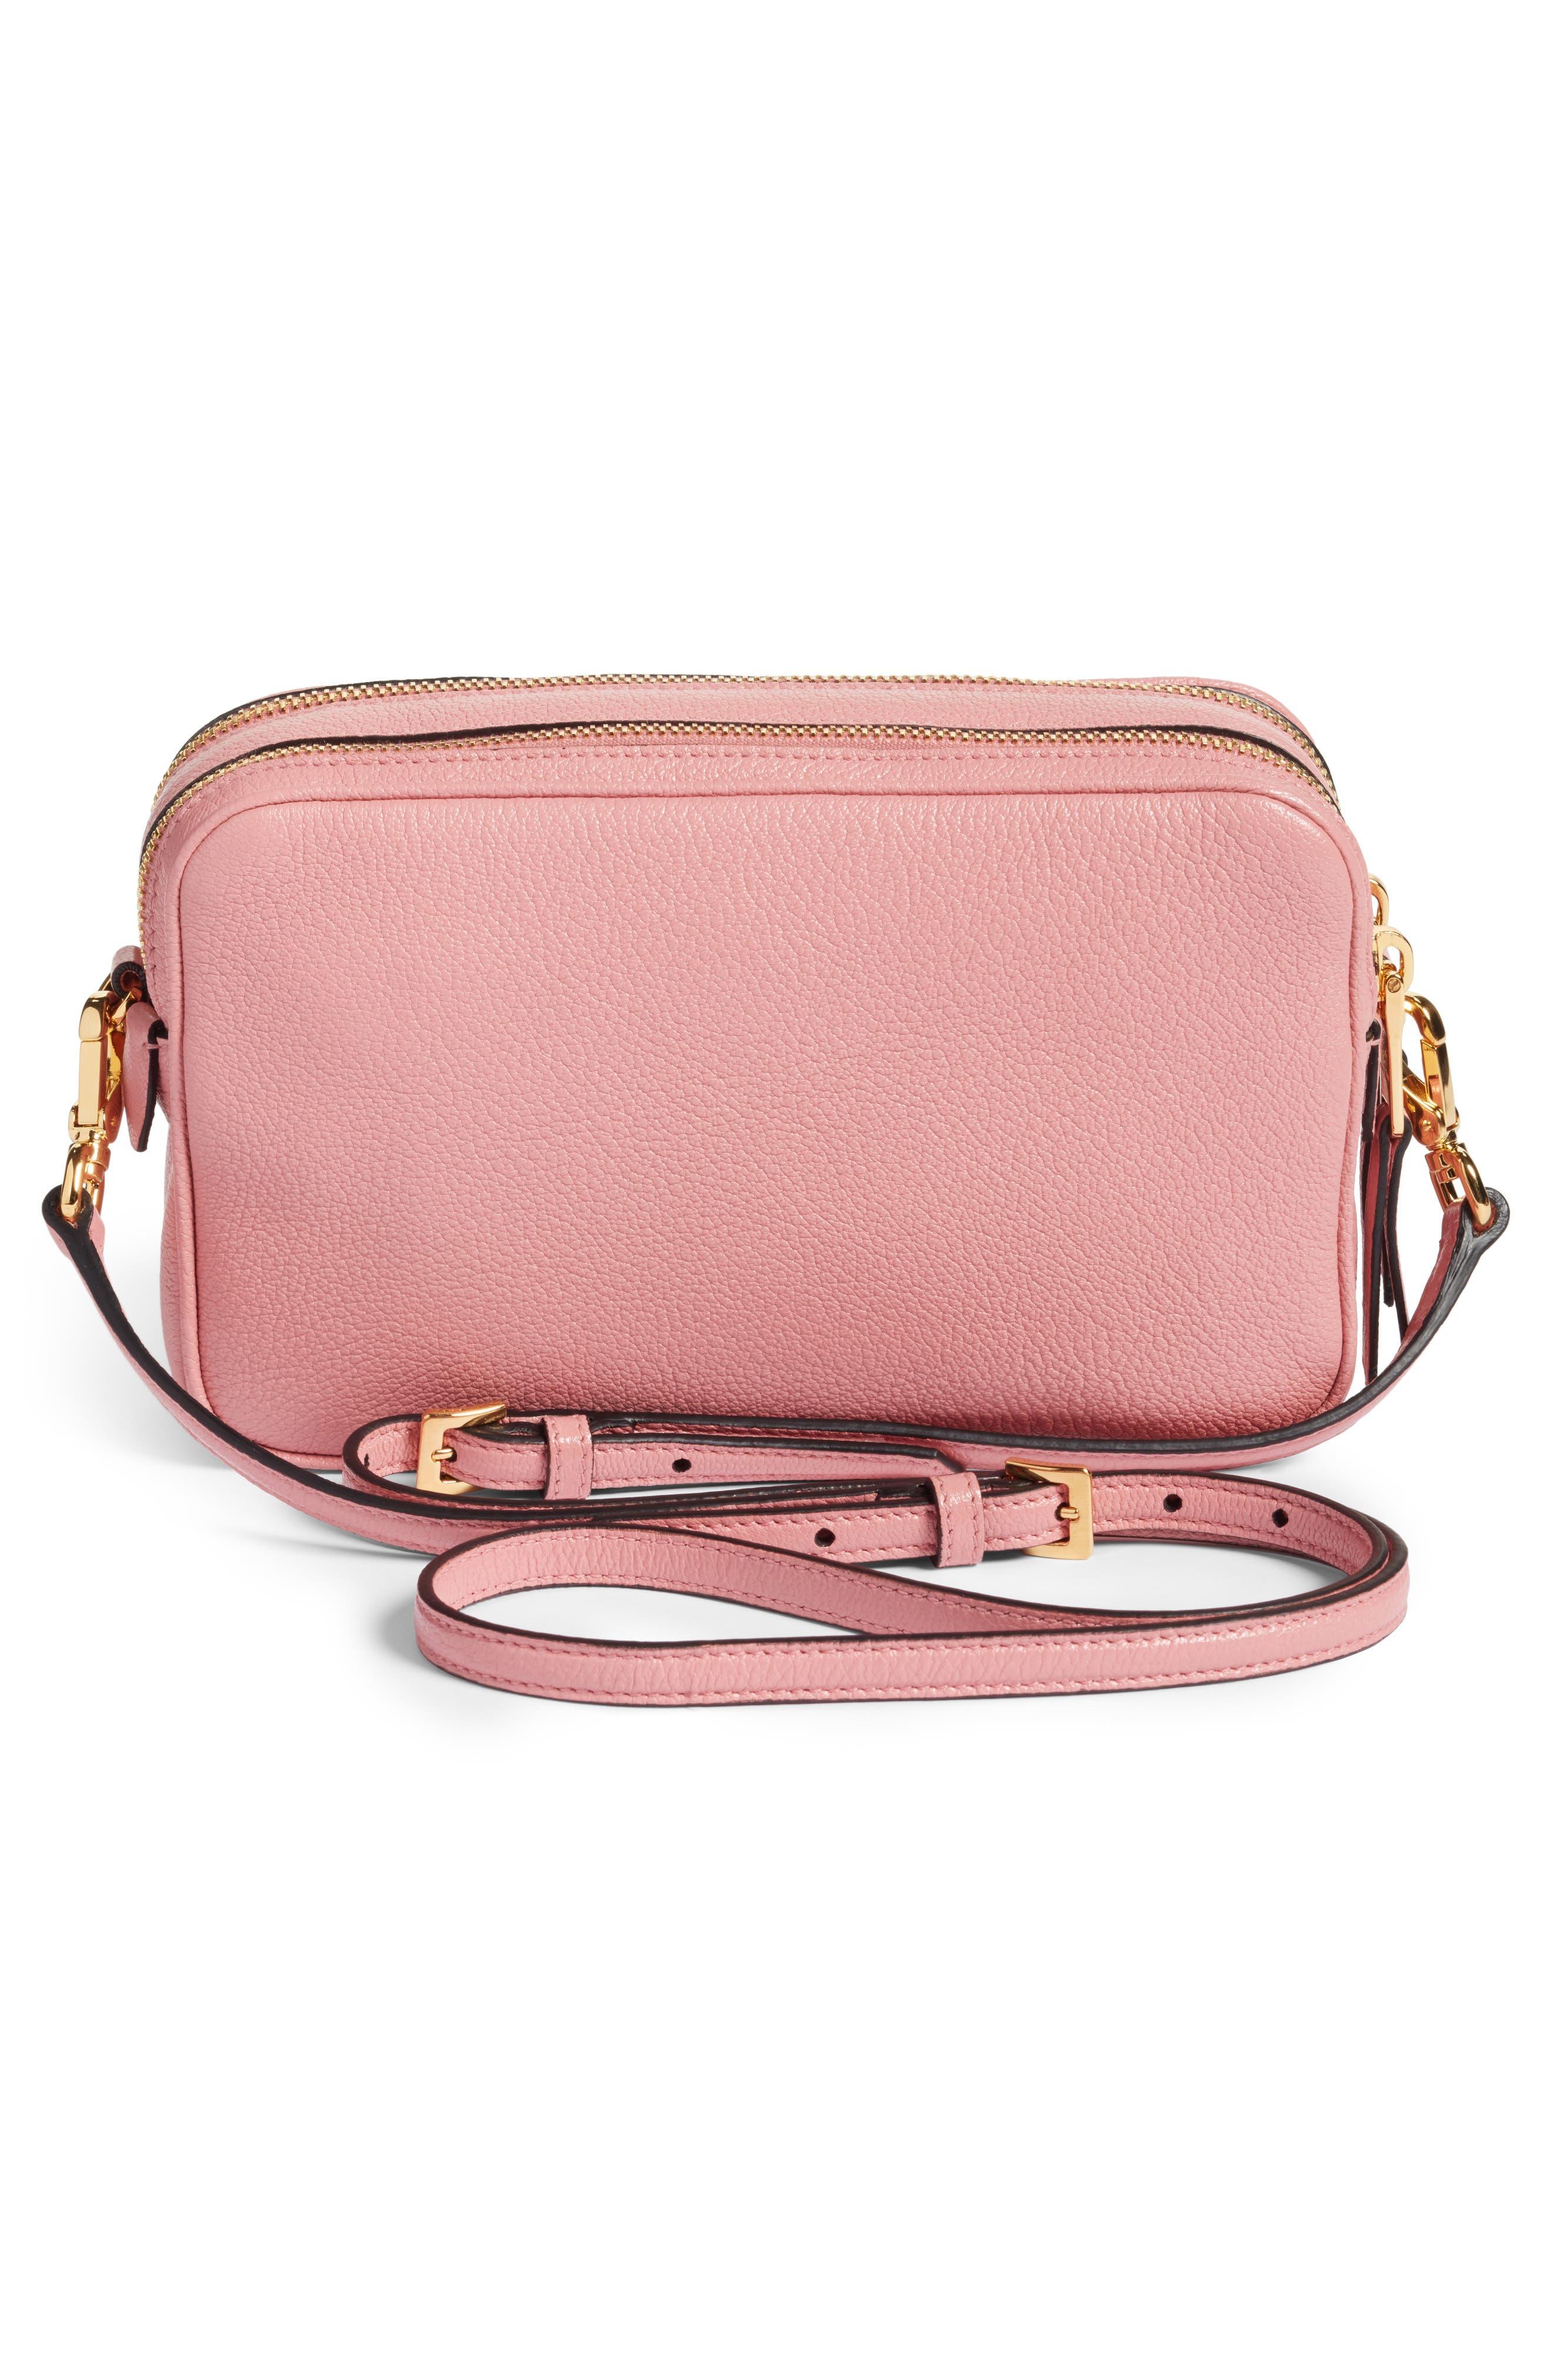 Madras Goatskin Leather Crossbody Bag,                             Alternate thumbnail 3, color,